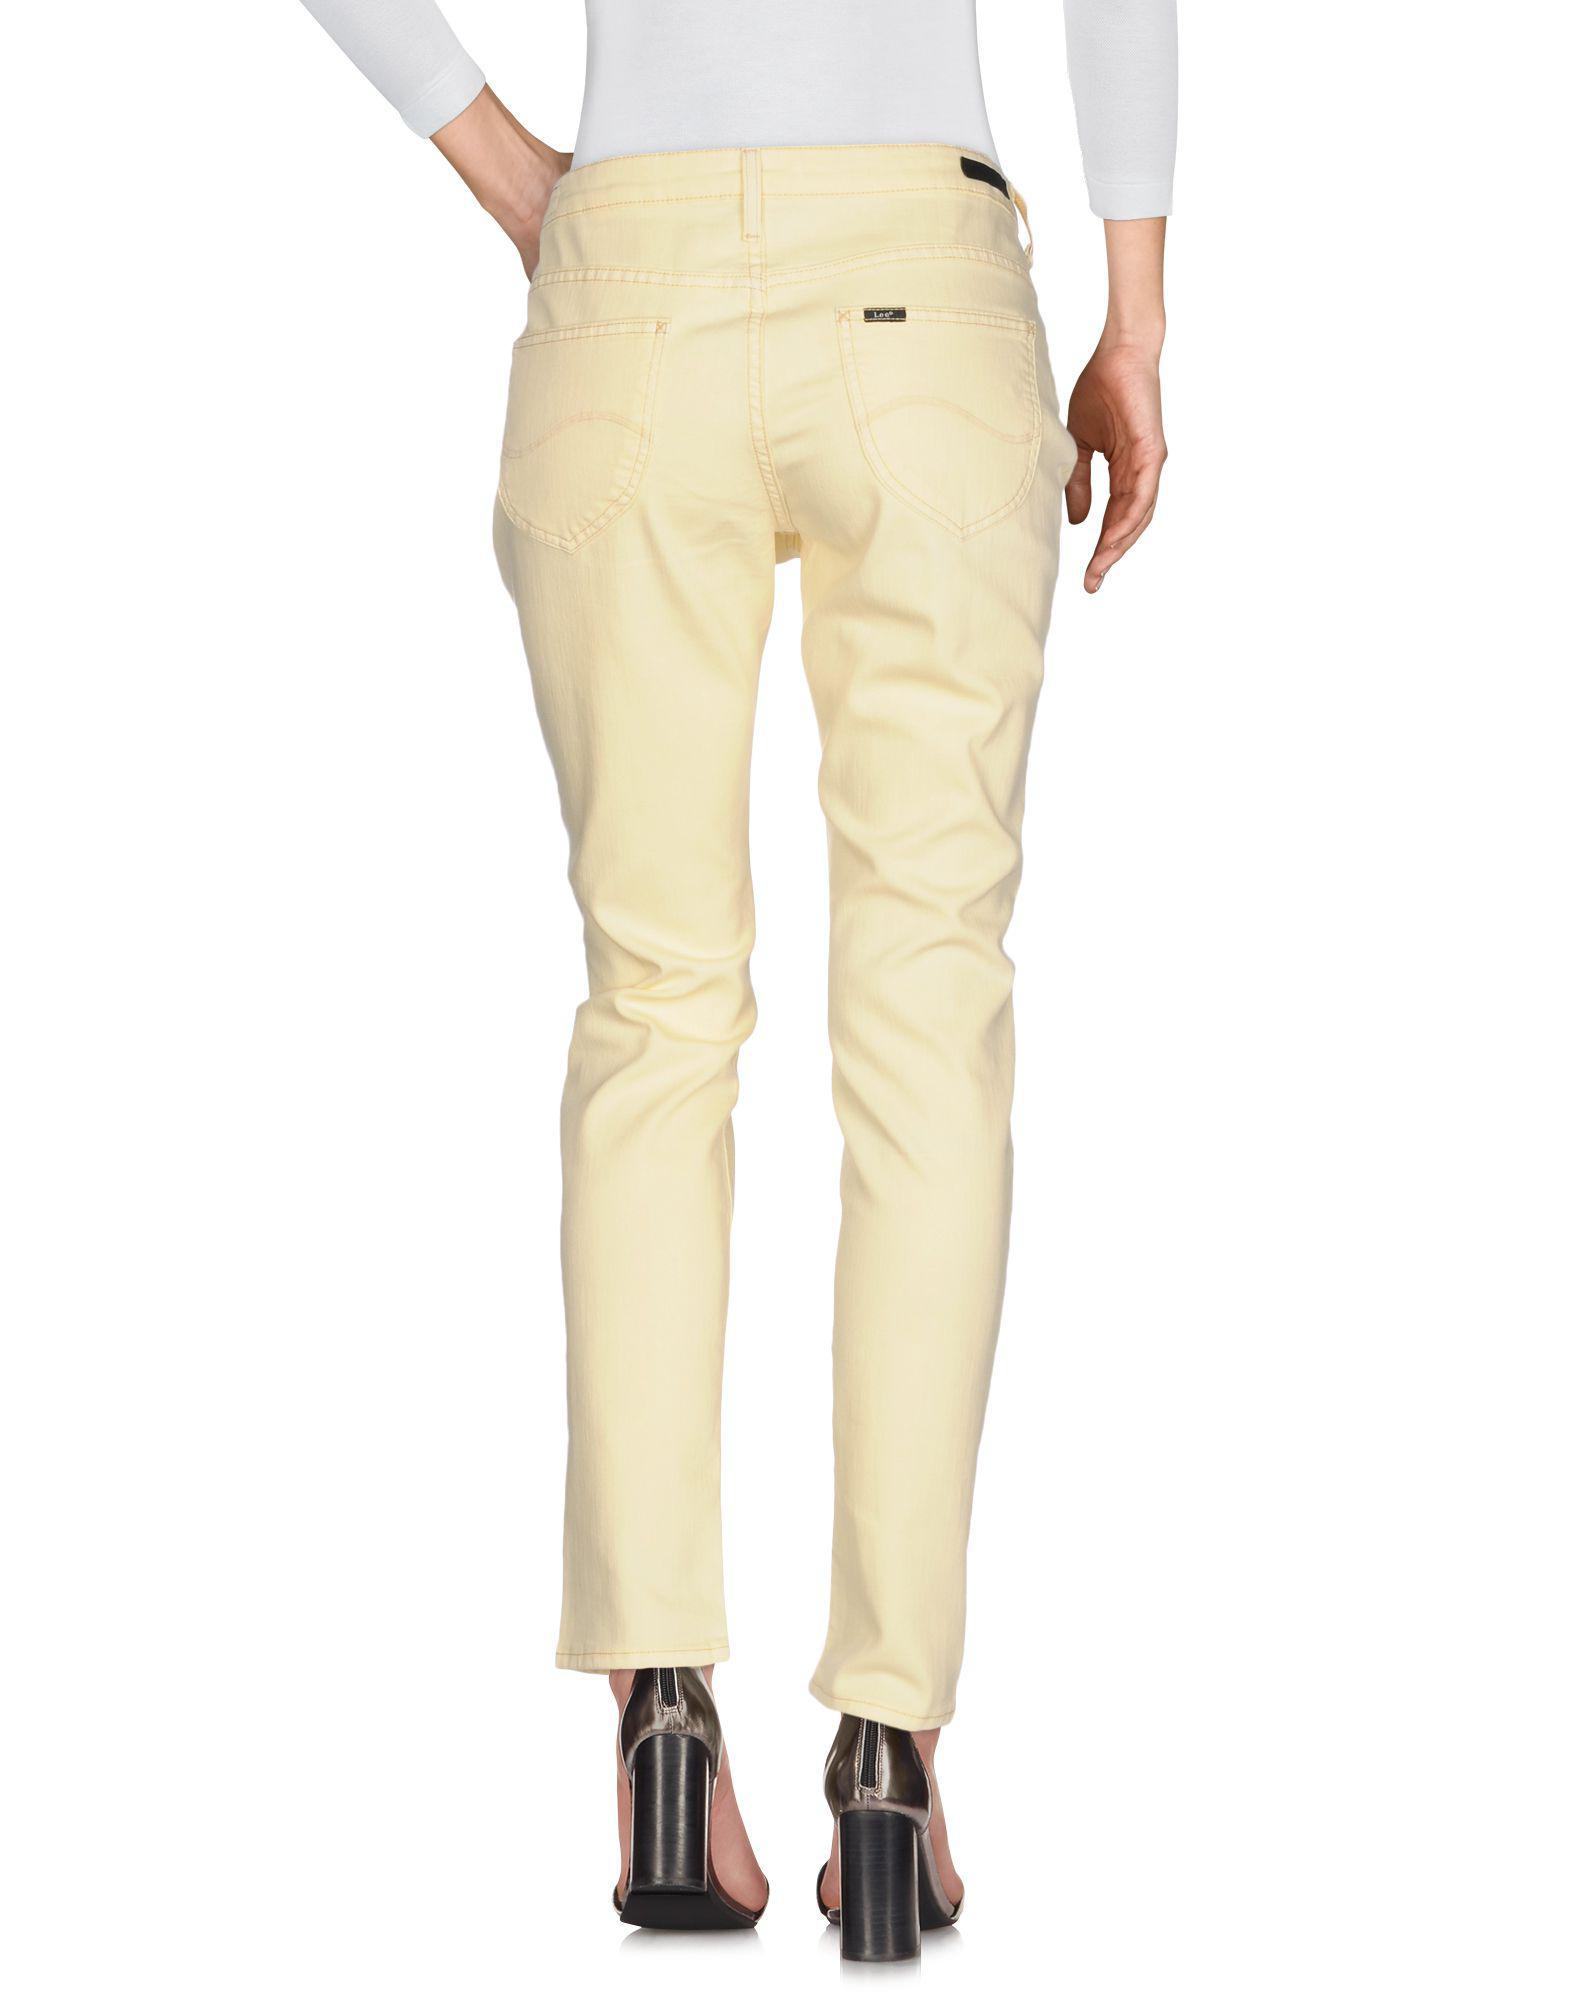 Lee Jeans Denim Pants in Light Yellow (Yellow)